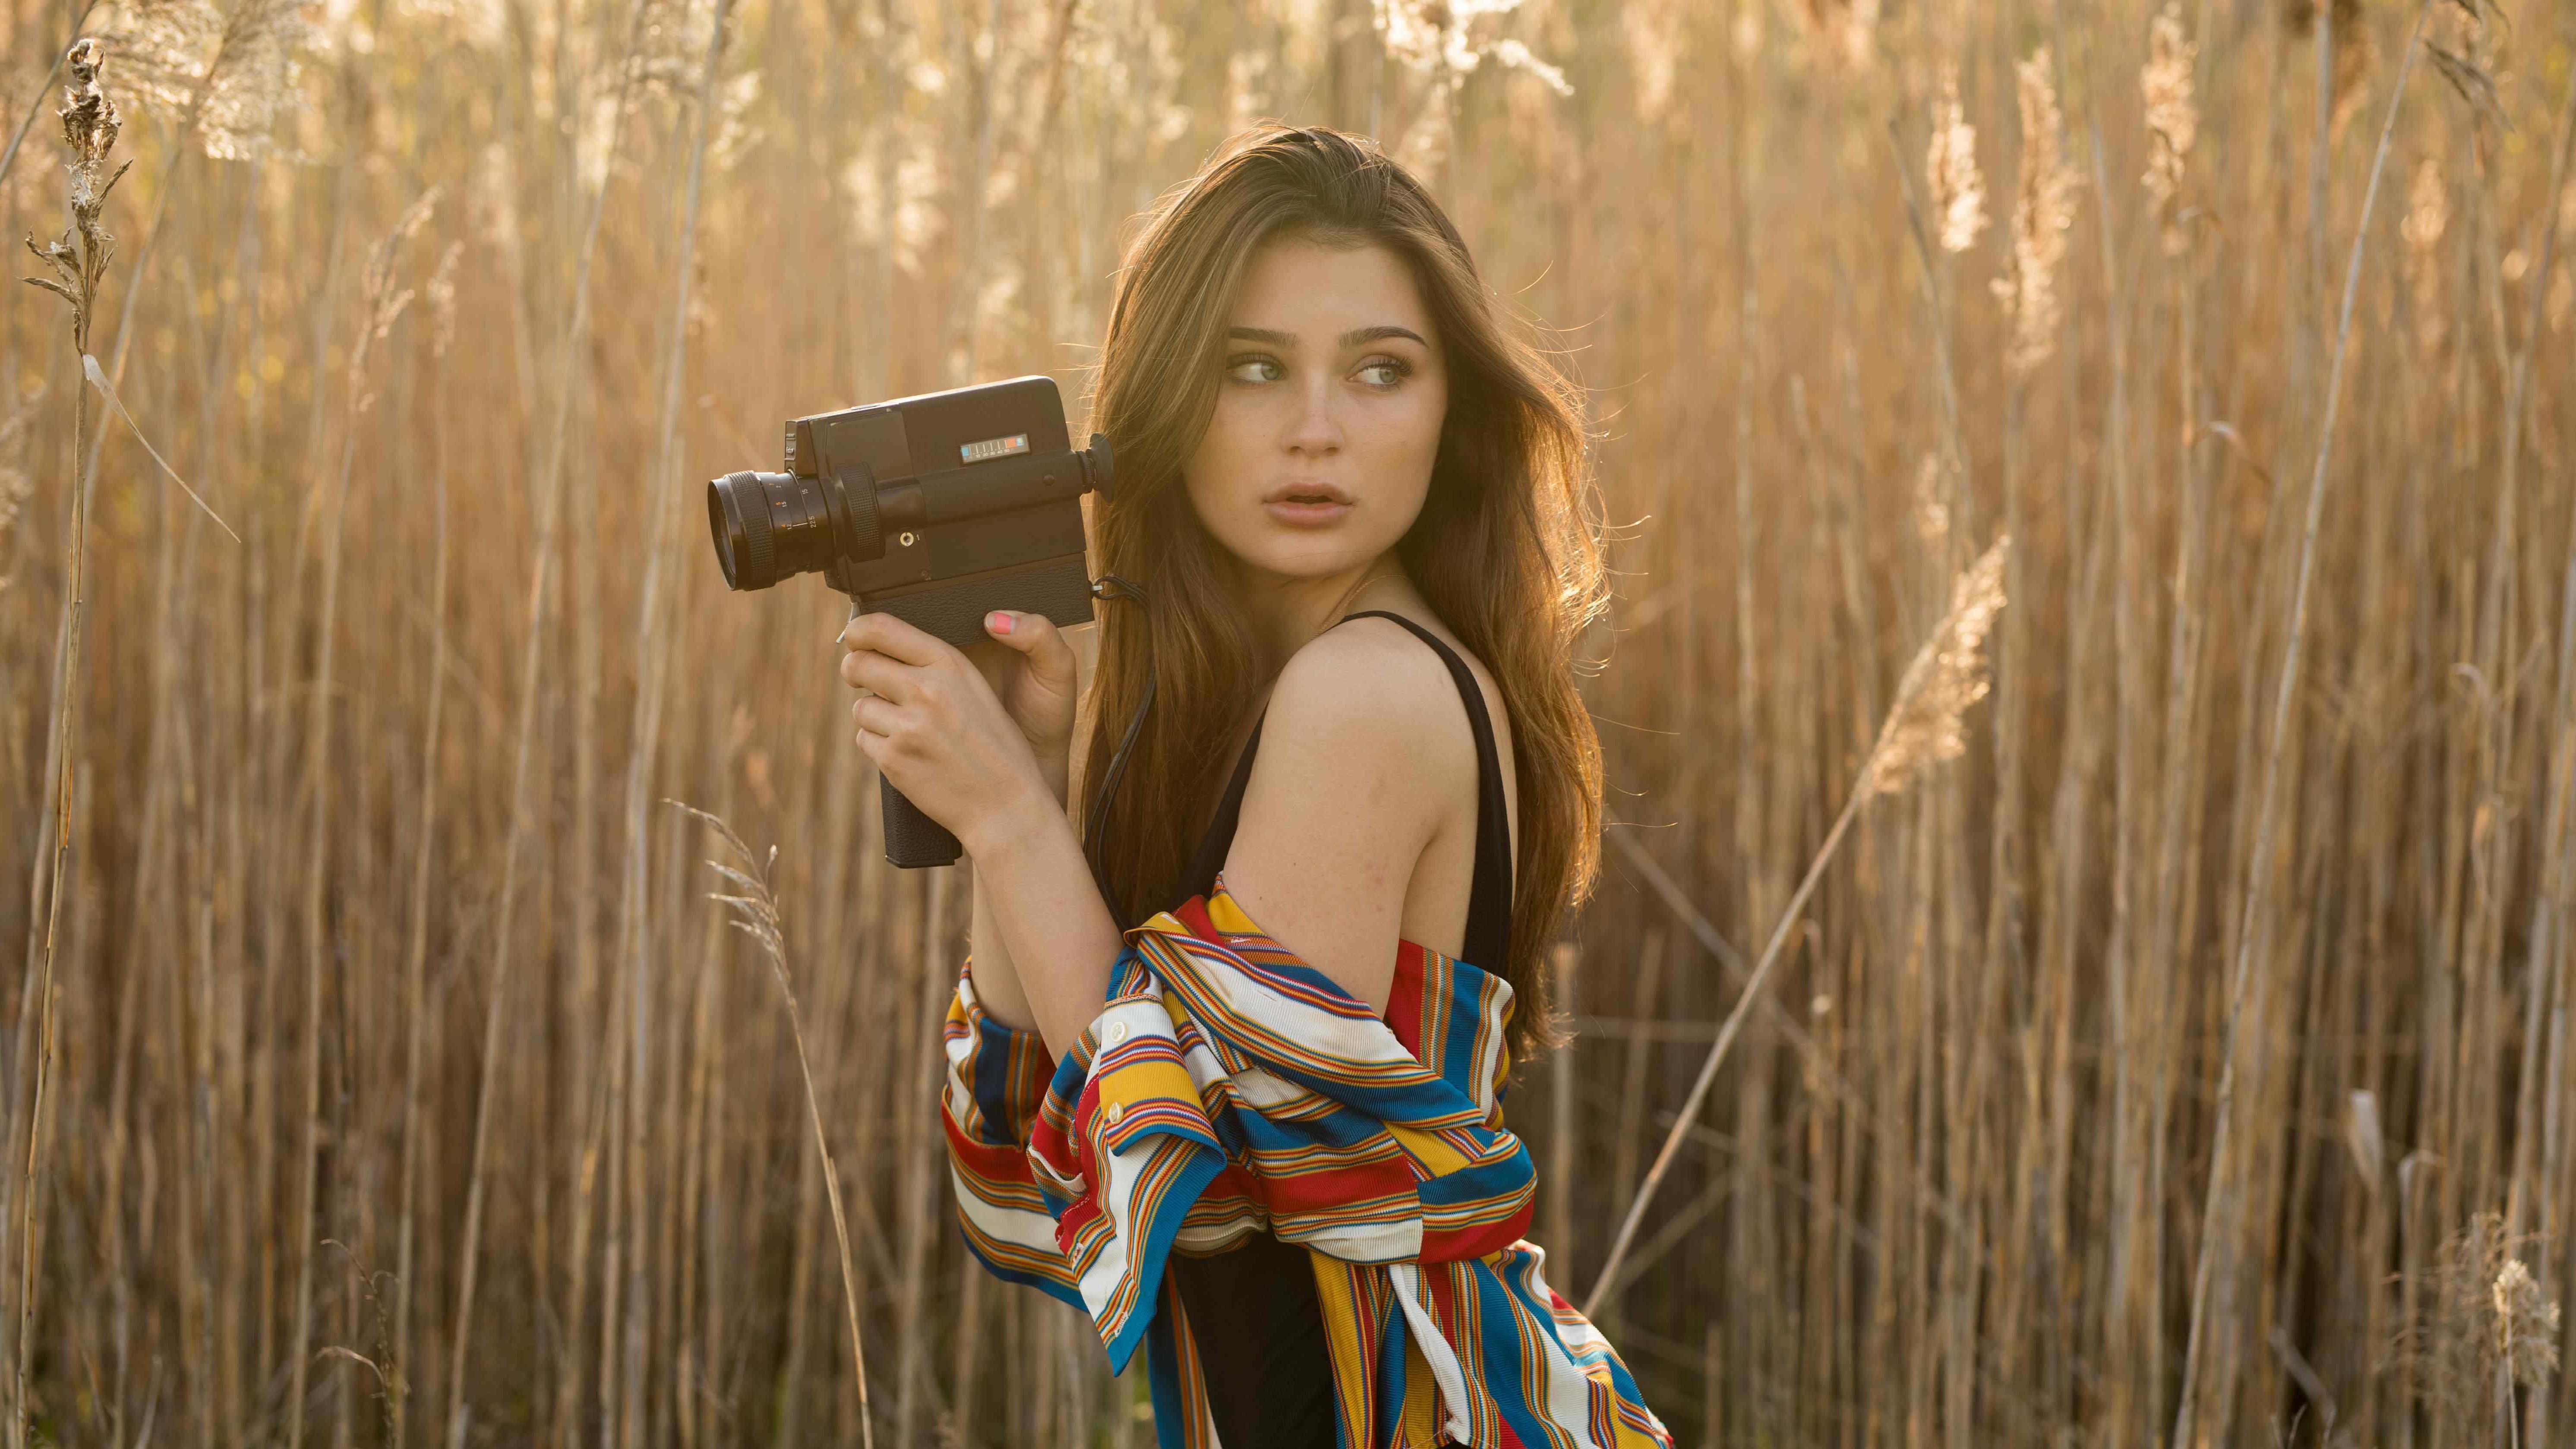 brunette girl in field with camera 1575664956 - Brunette Girl In Field With Camera -